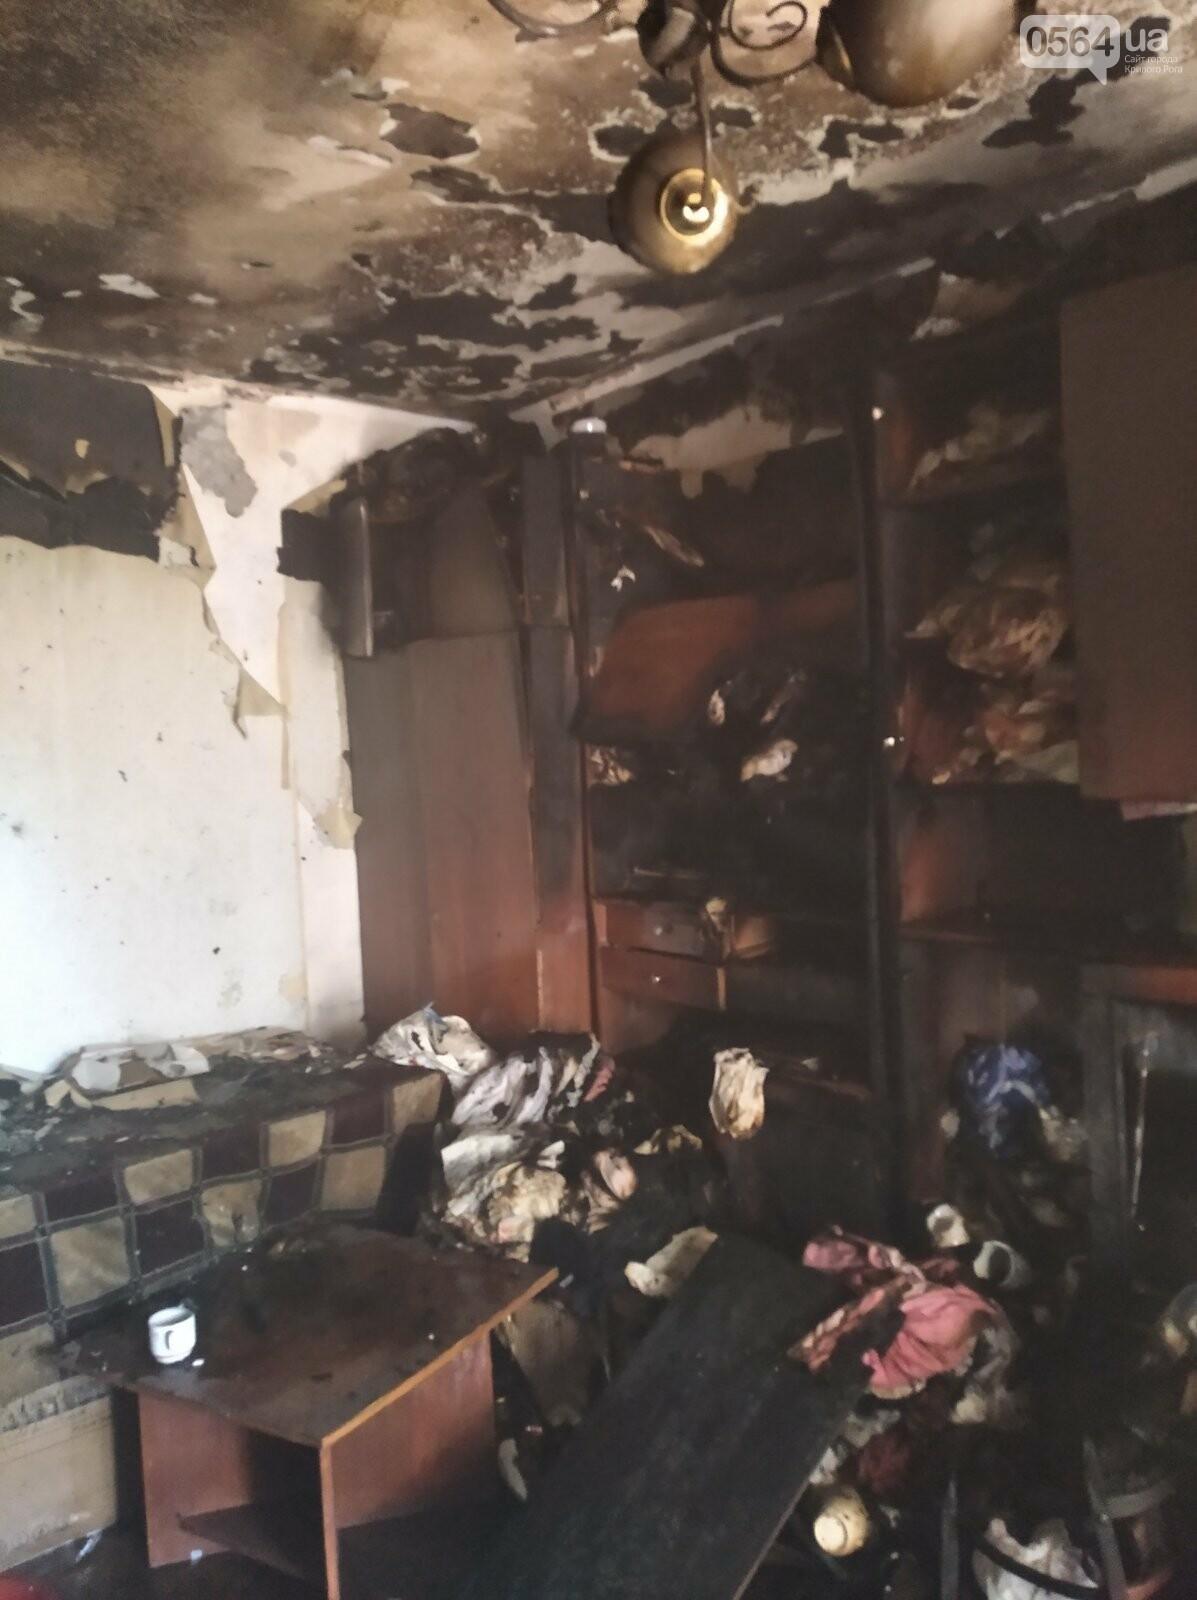 В Кривом Роге на пожаре в многоэтажке погиб 31-летний мужчина, - ФОТО, фото-3